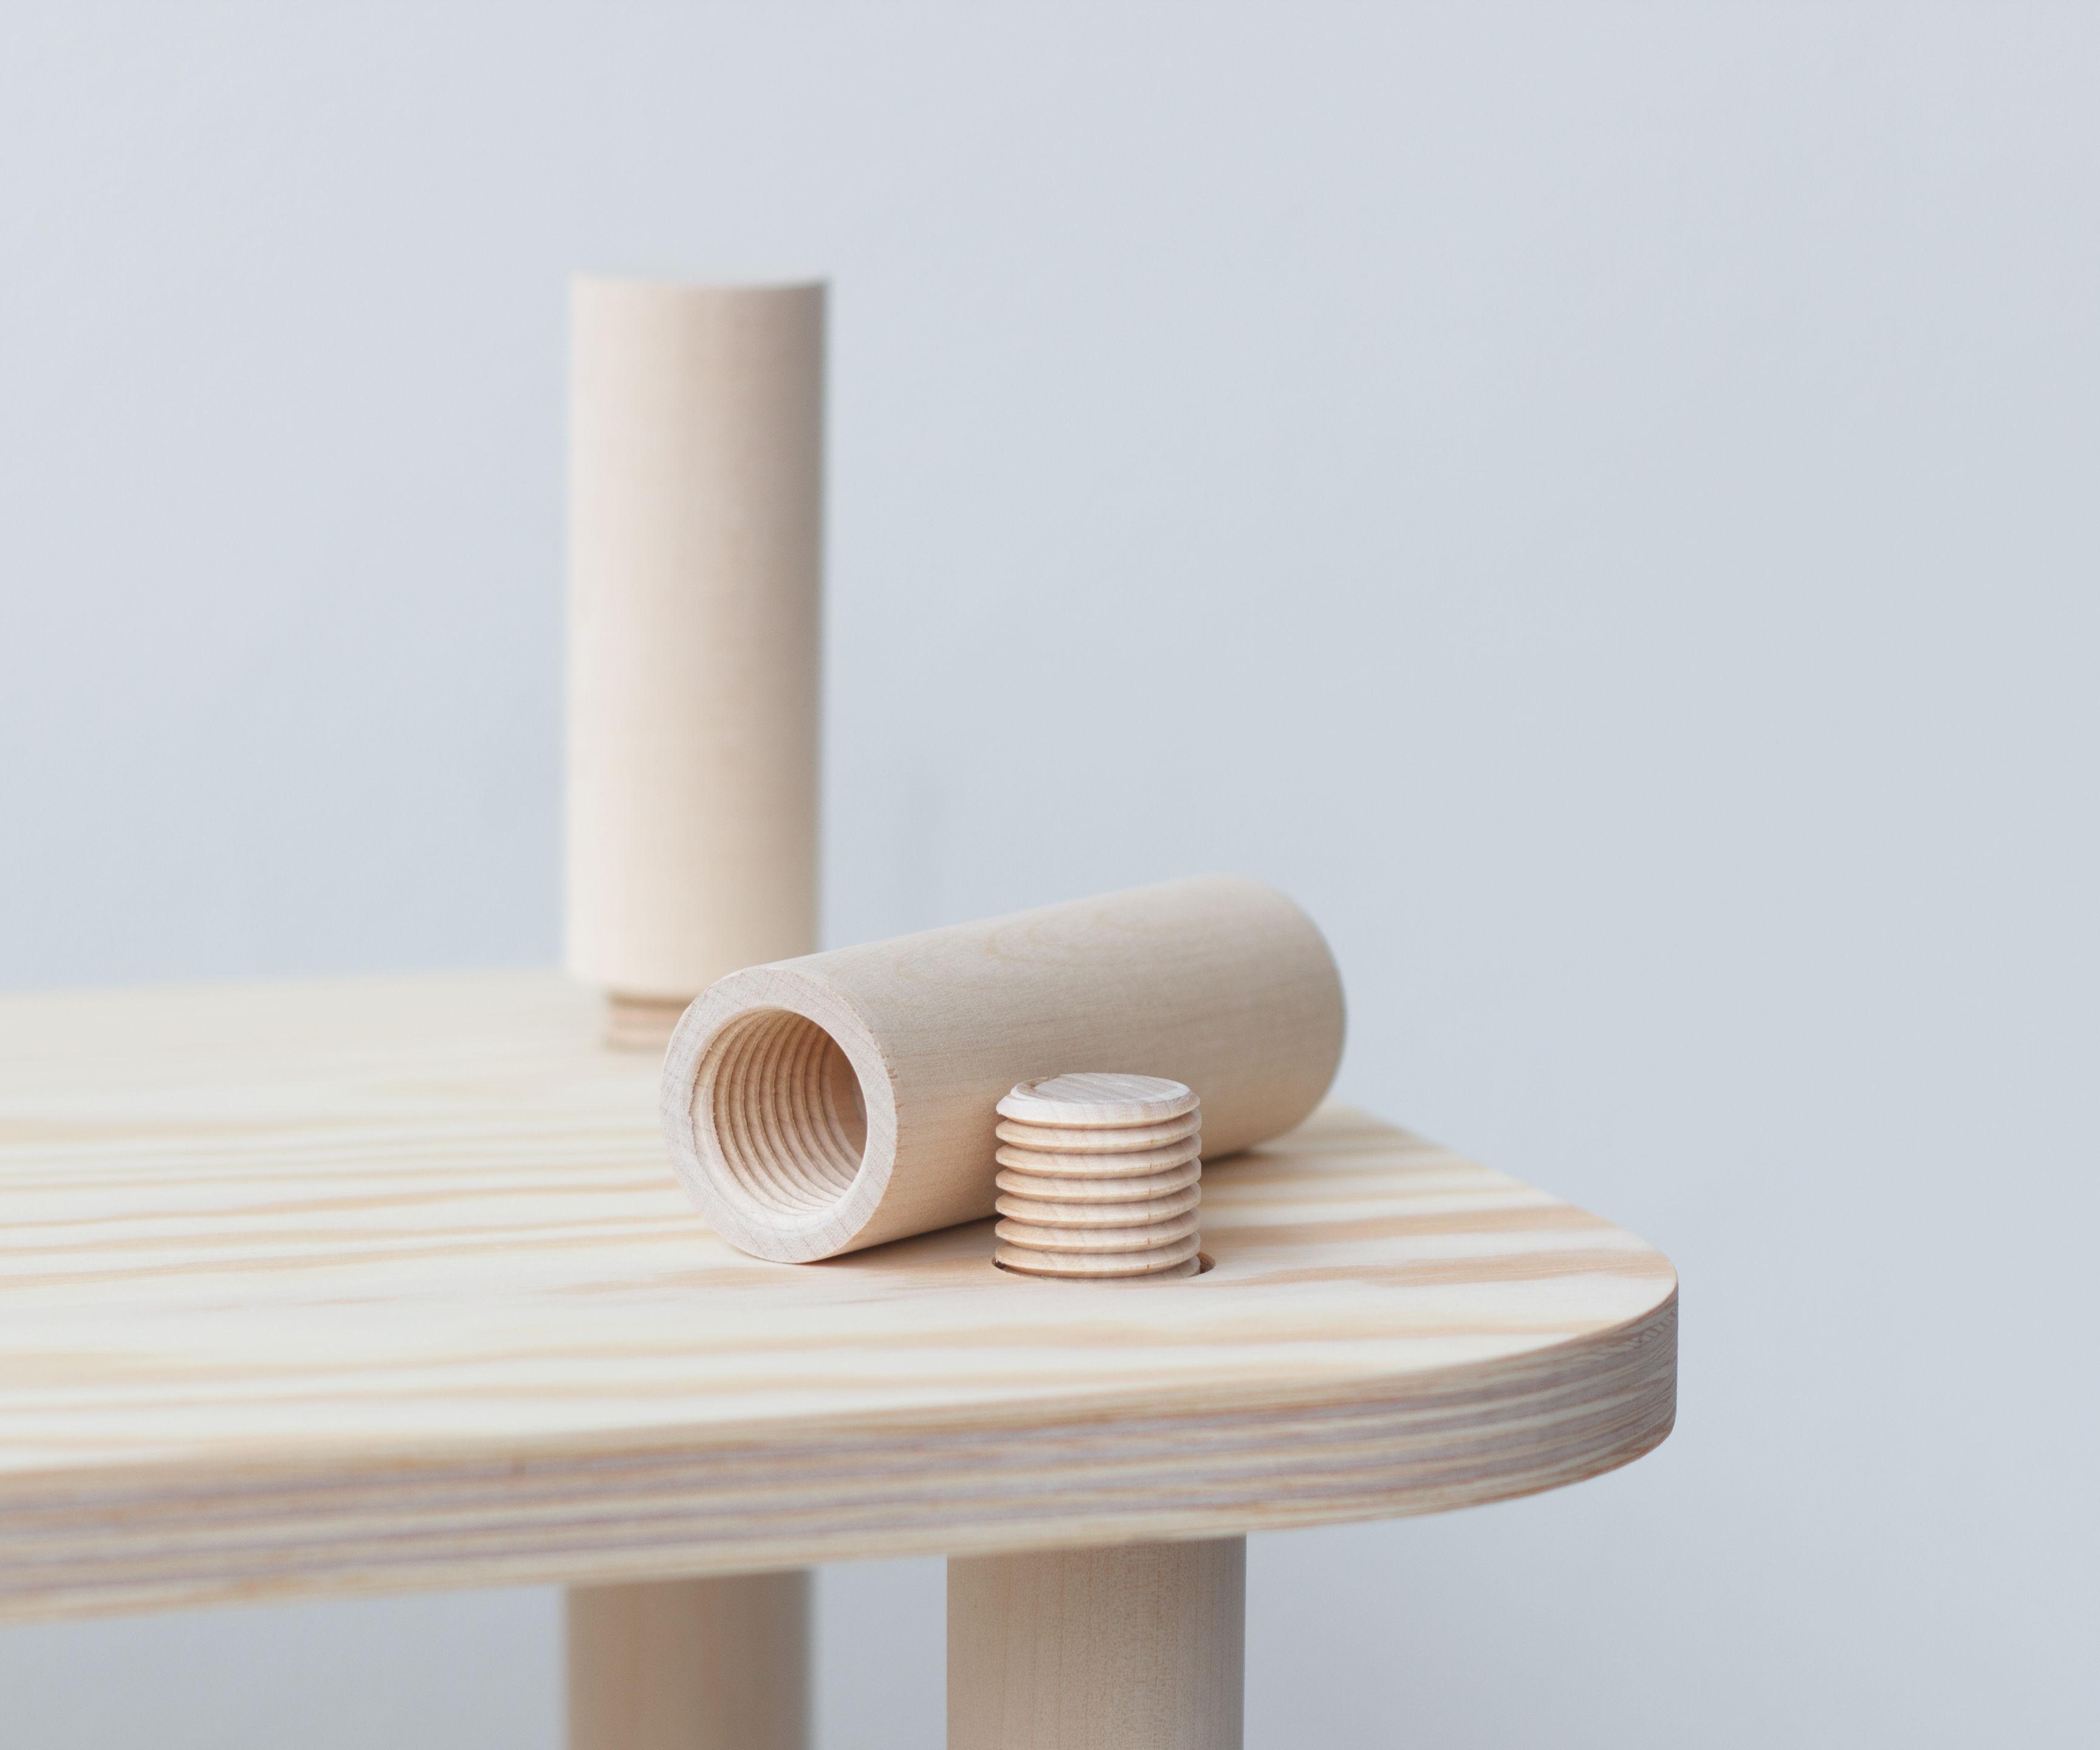 TS1 modular shelving (with CNC wood threading)